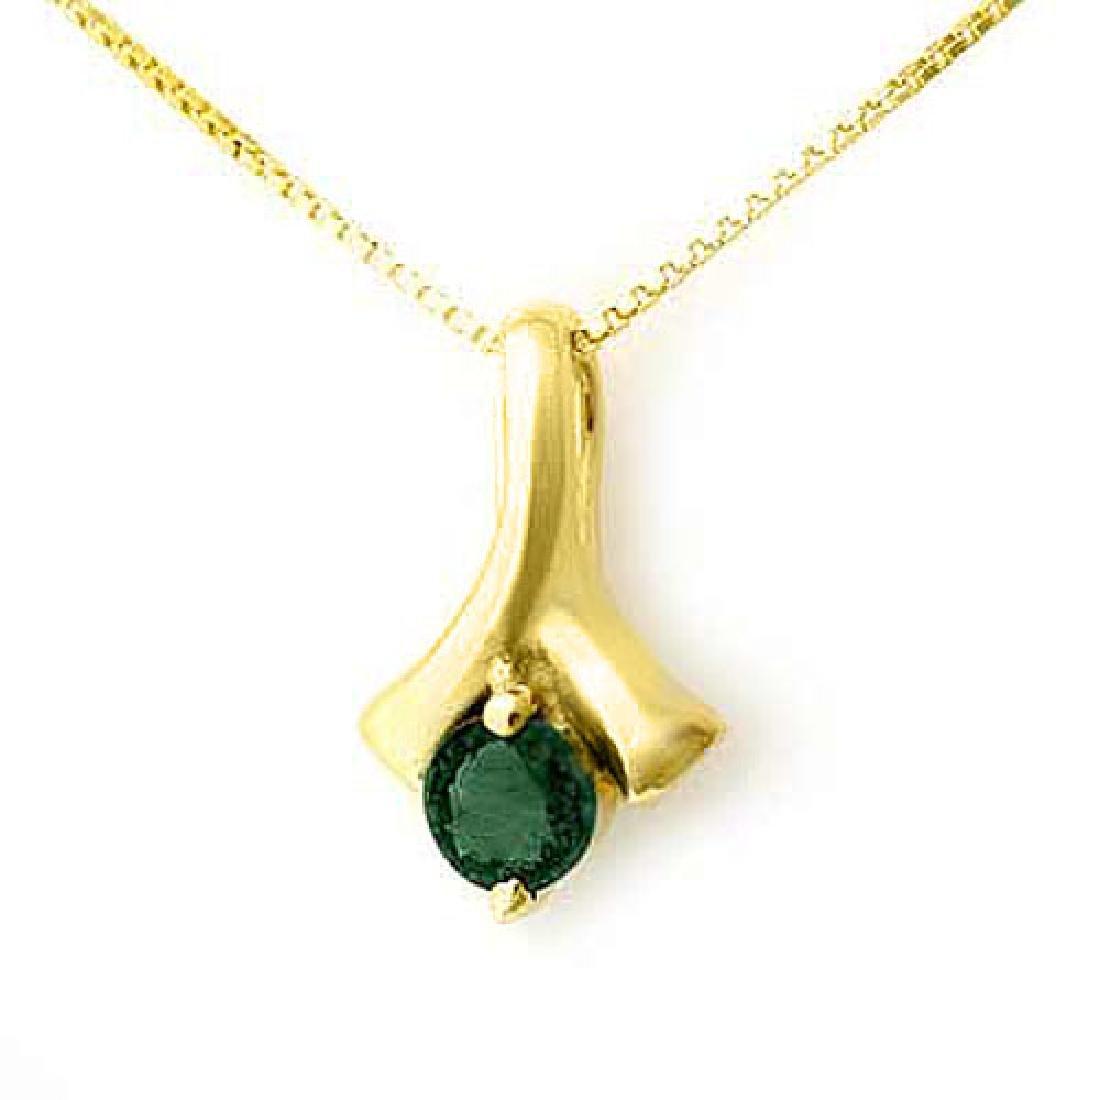 0.25 CTW Emerald Pendant 10K Yellow Gold